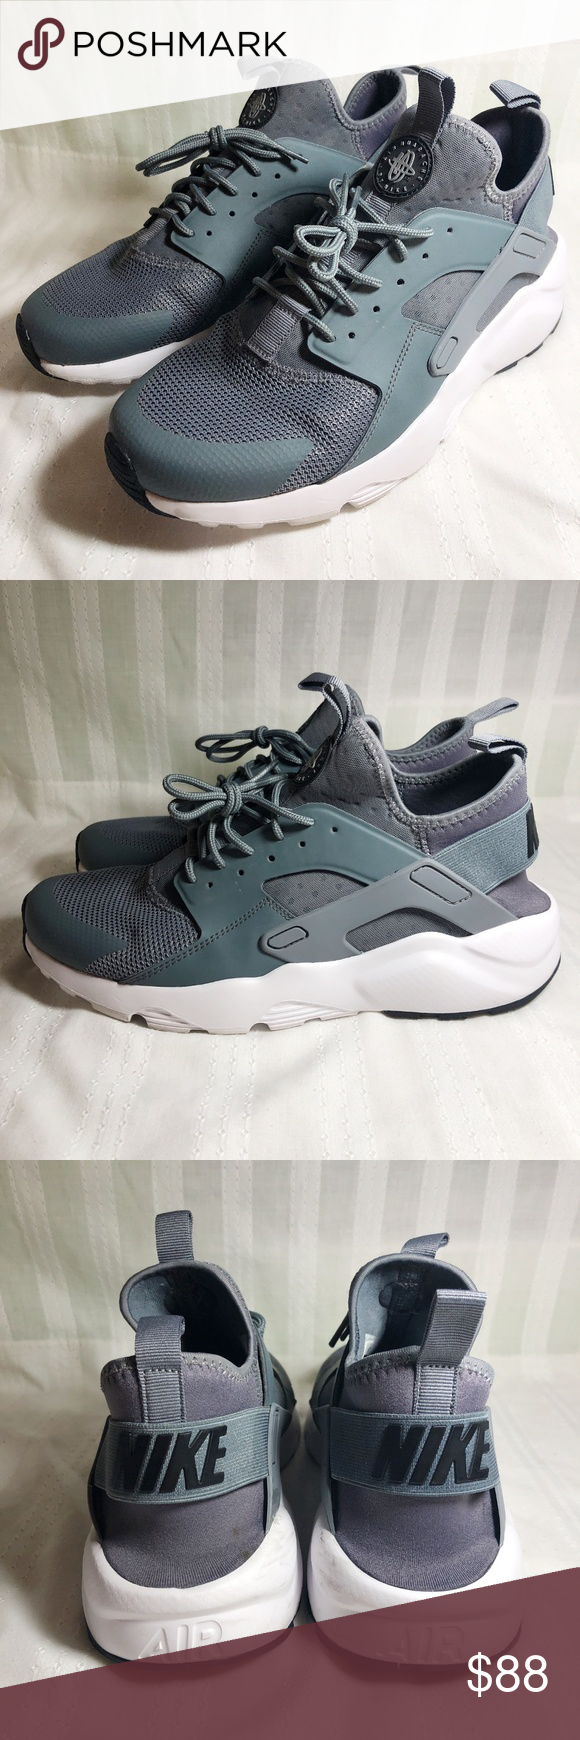 4cbe6a4c9cb23 Nike Men s Air Huarache Run Ultra Sz 9.5 Cool Grey Nike Men s Air Huarache  Run Ultra